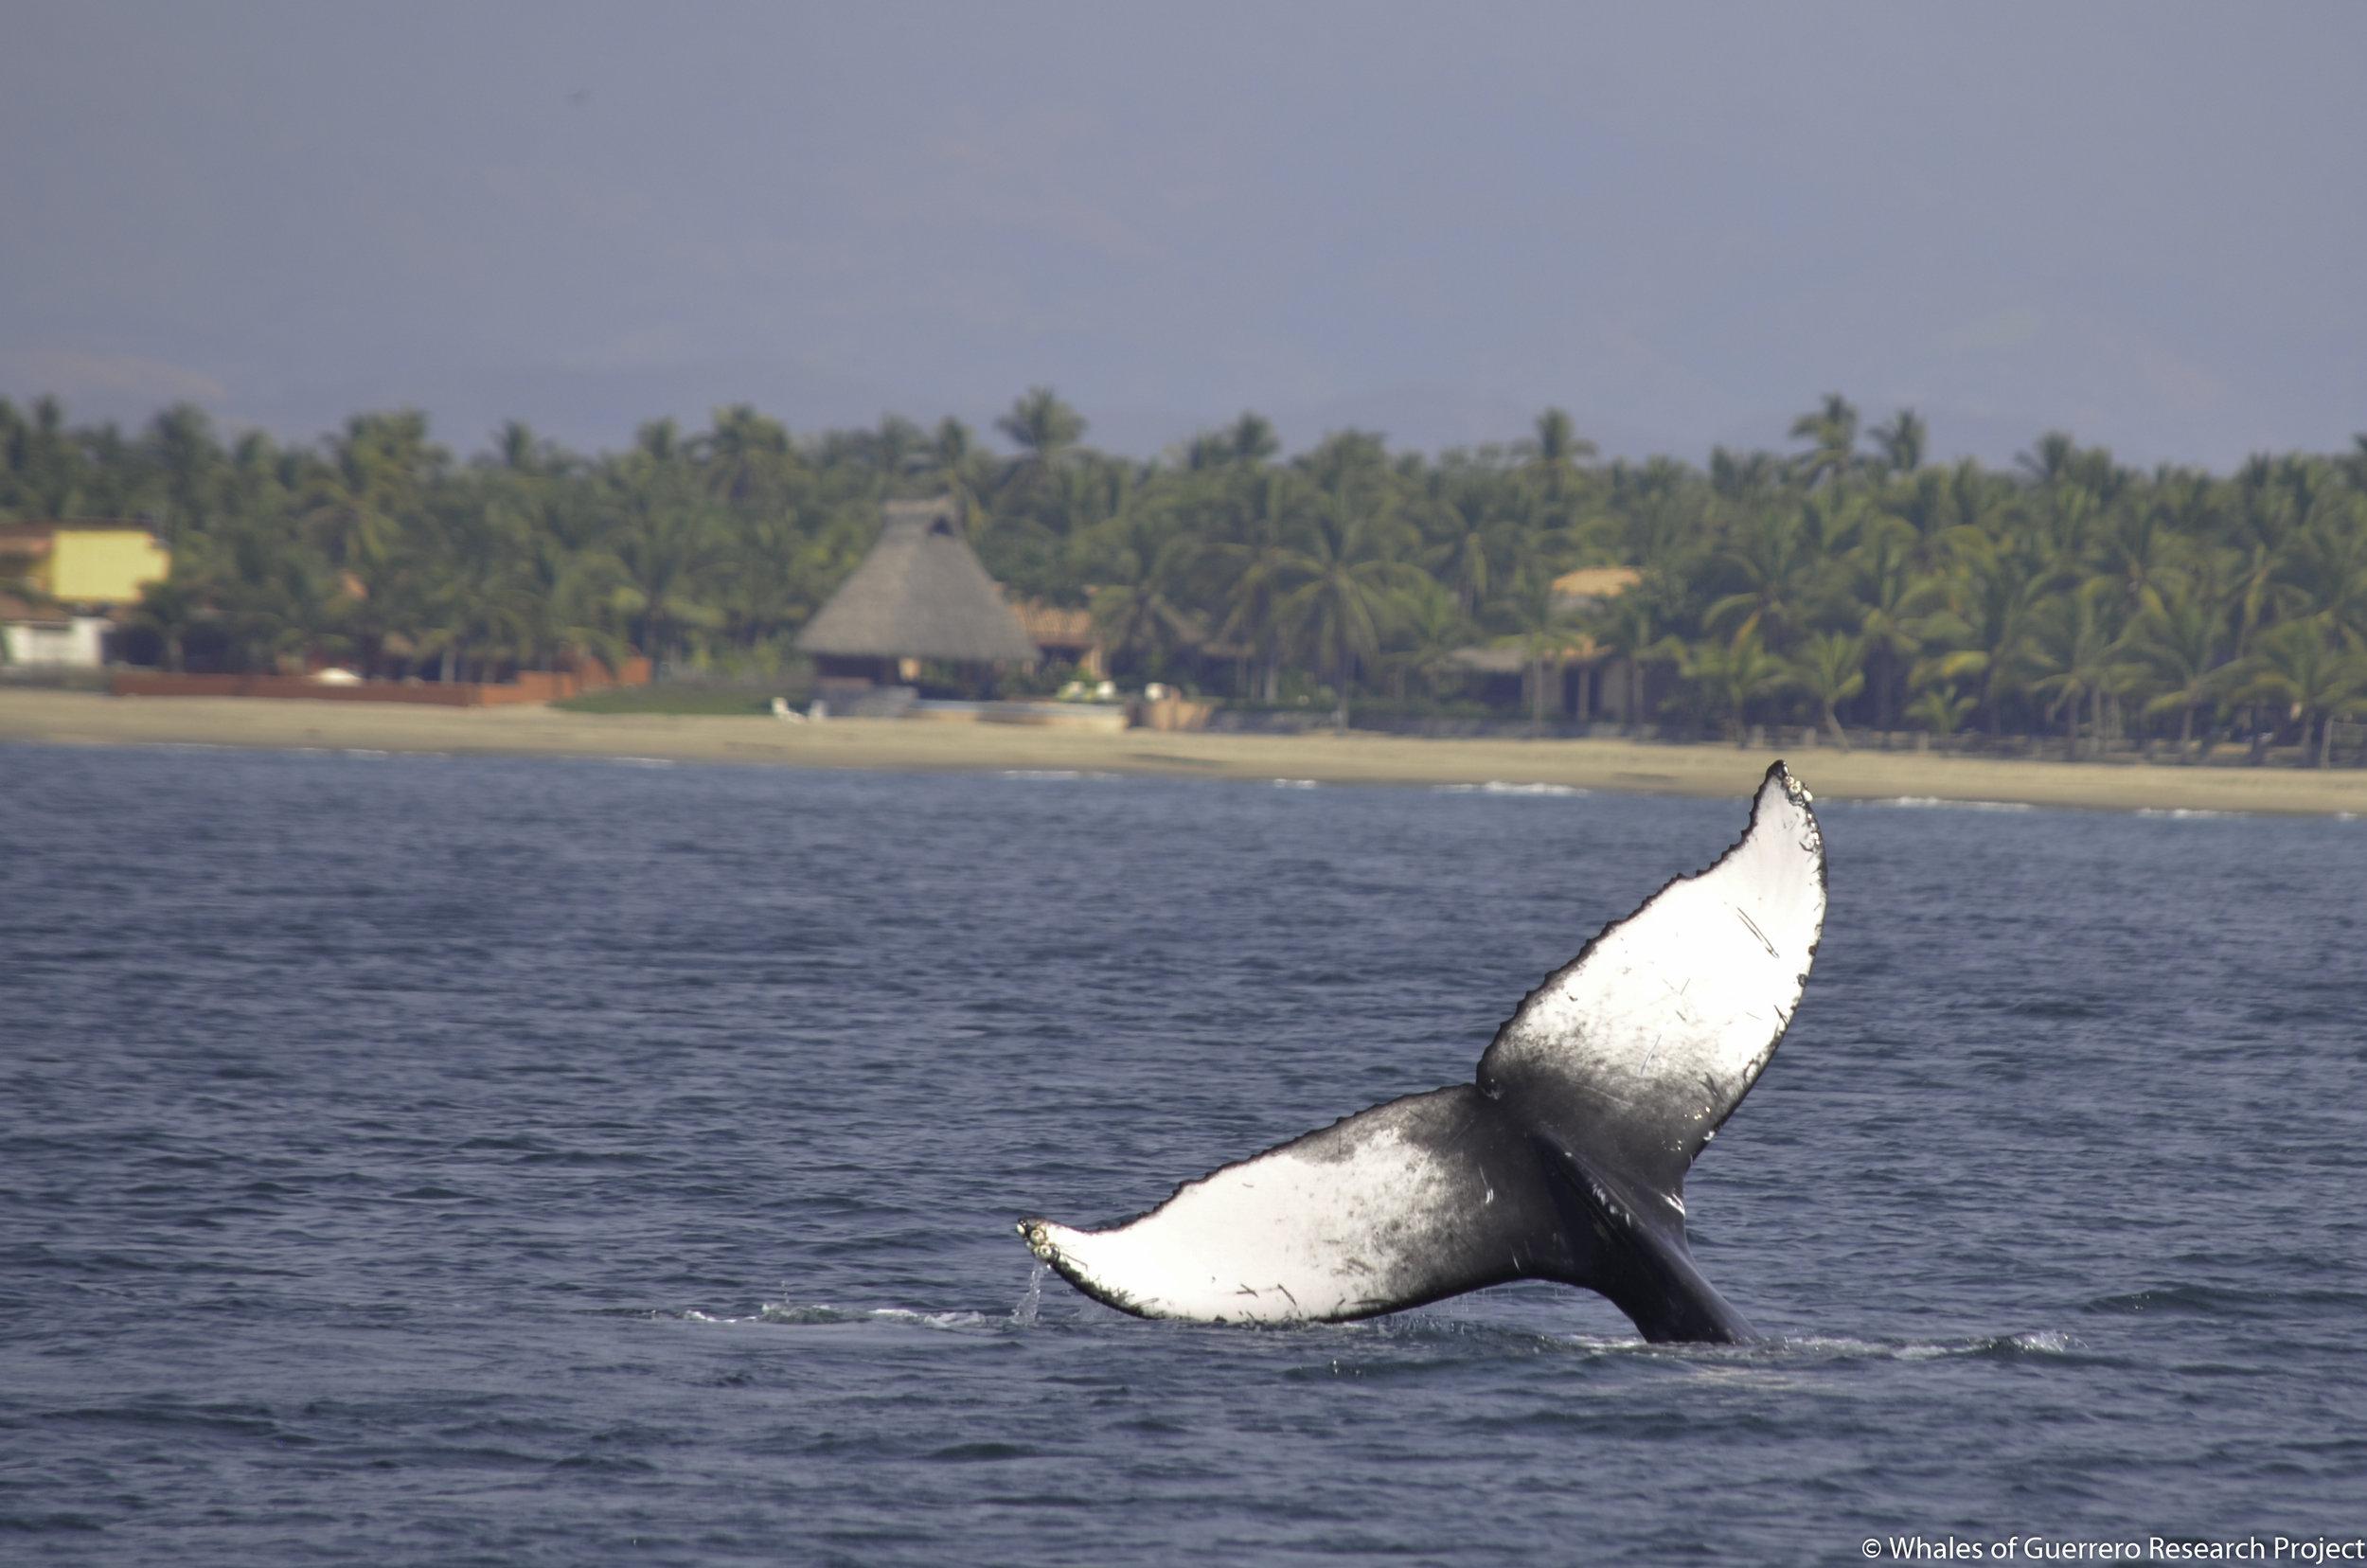 Humpback whale off coast of Barra de Potosí